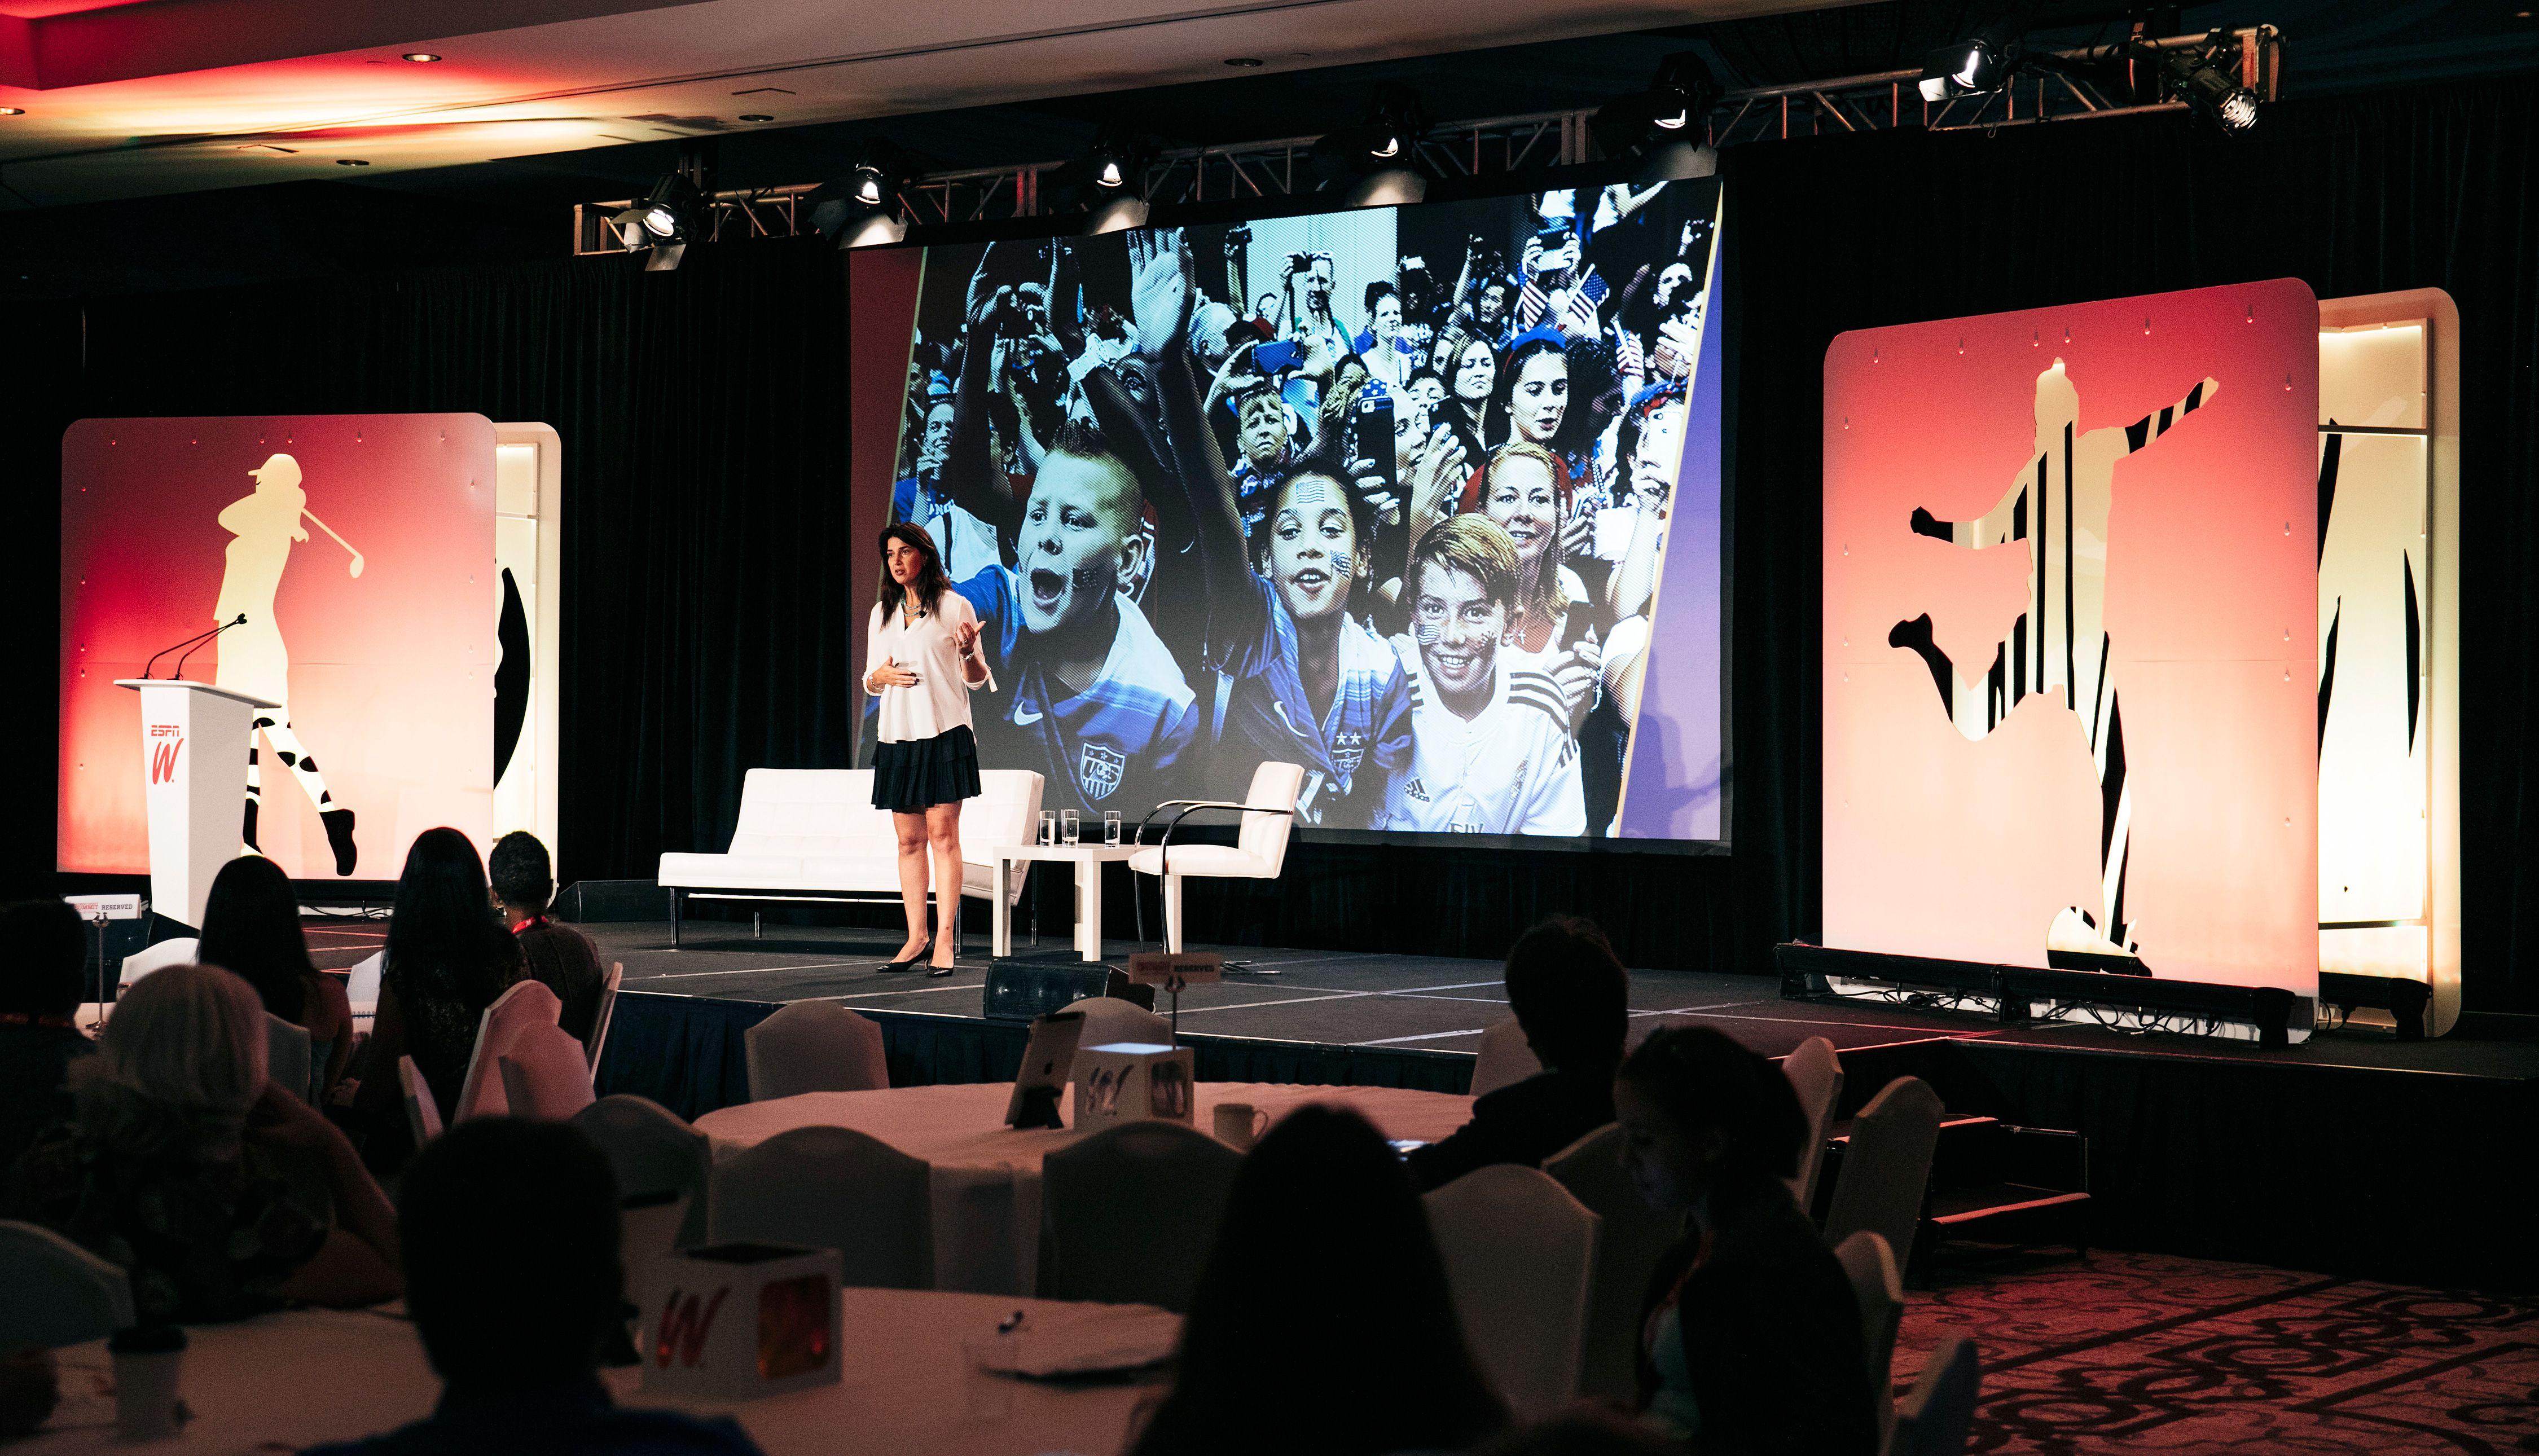 2015 espnW: Women  Sports Summit: The Year of the Woman